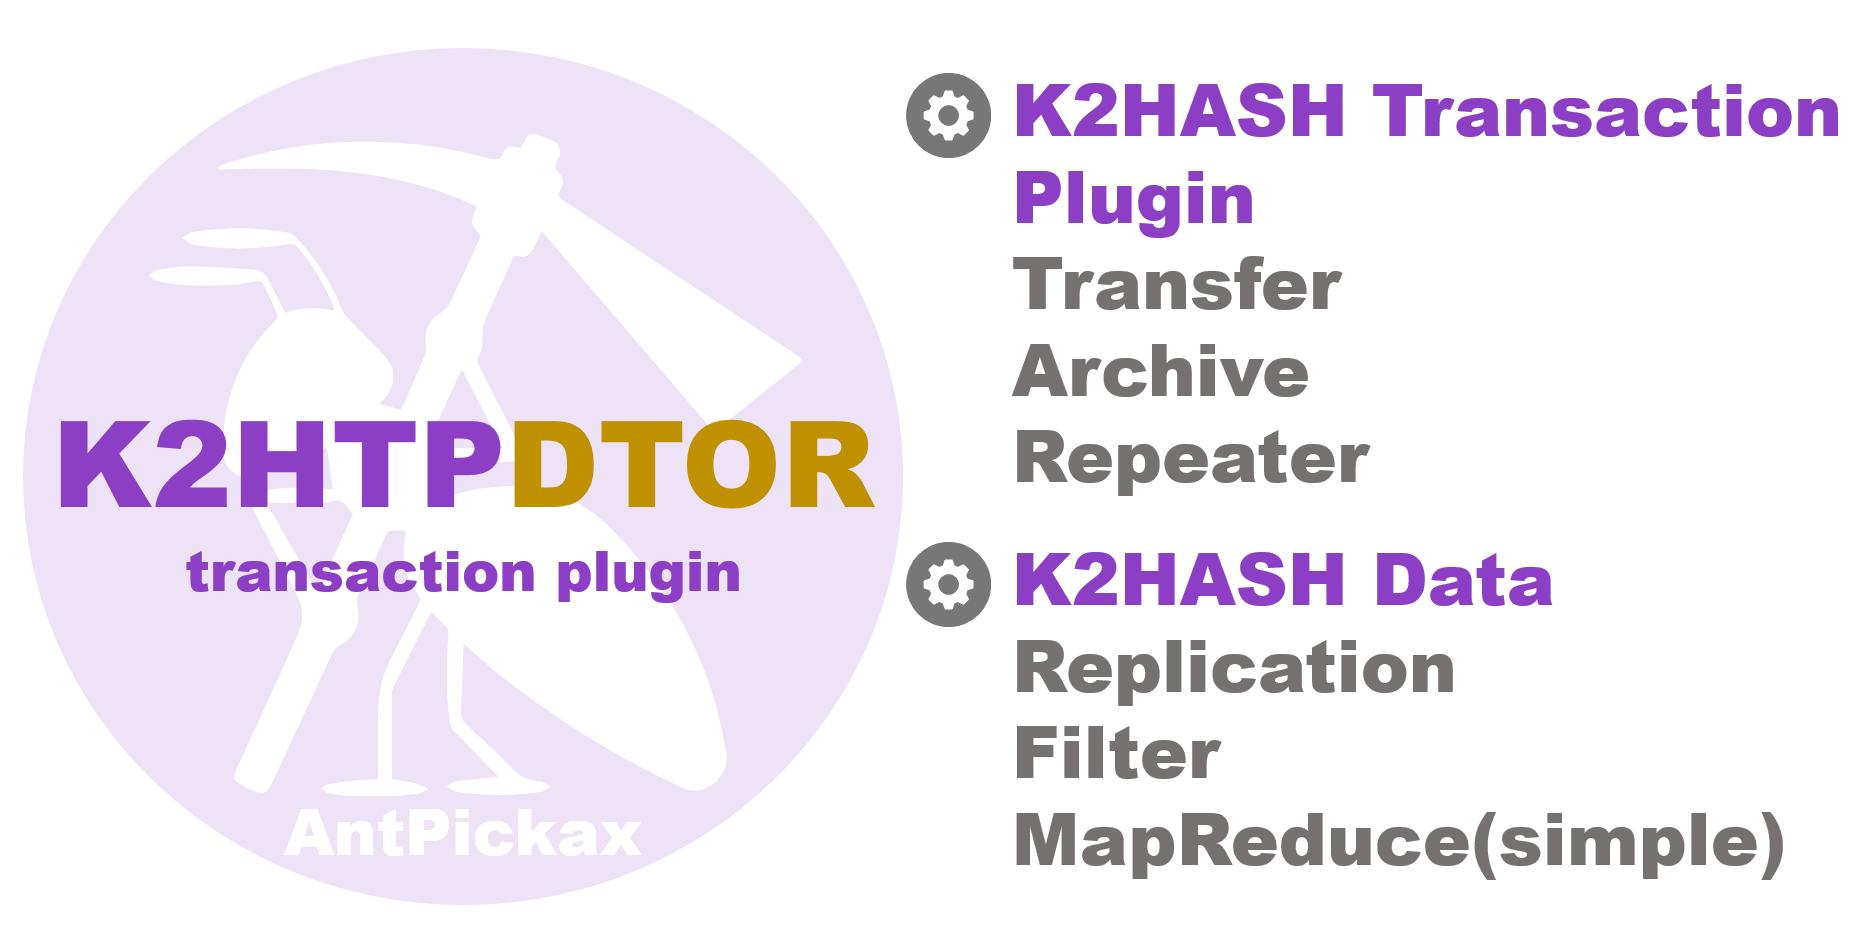 K2HTPDTOR